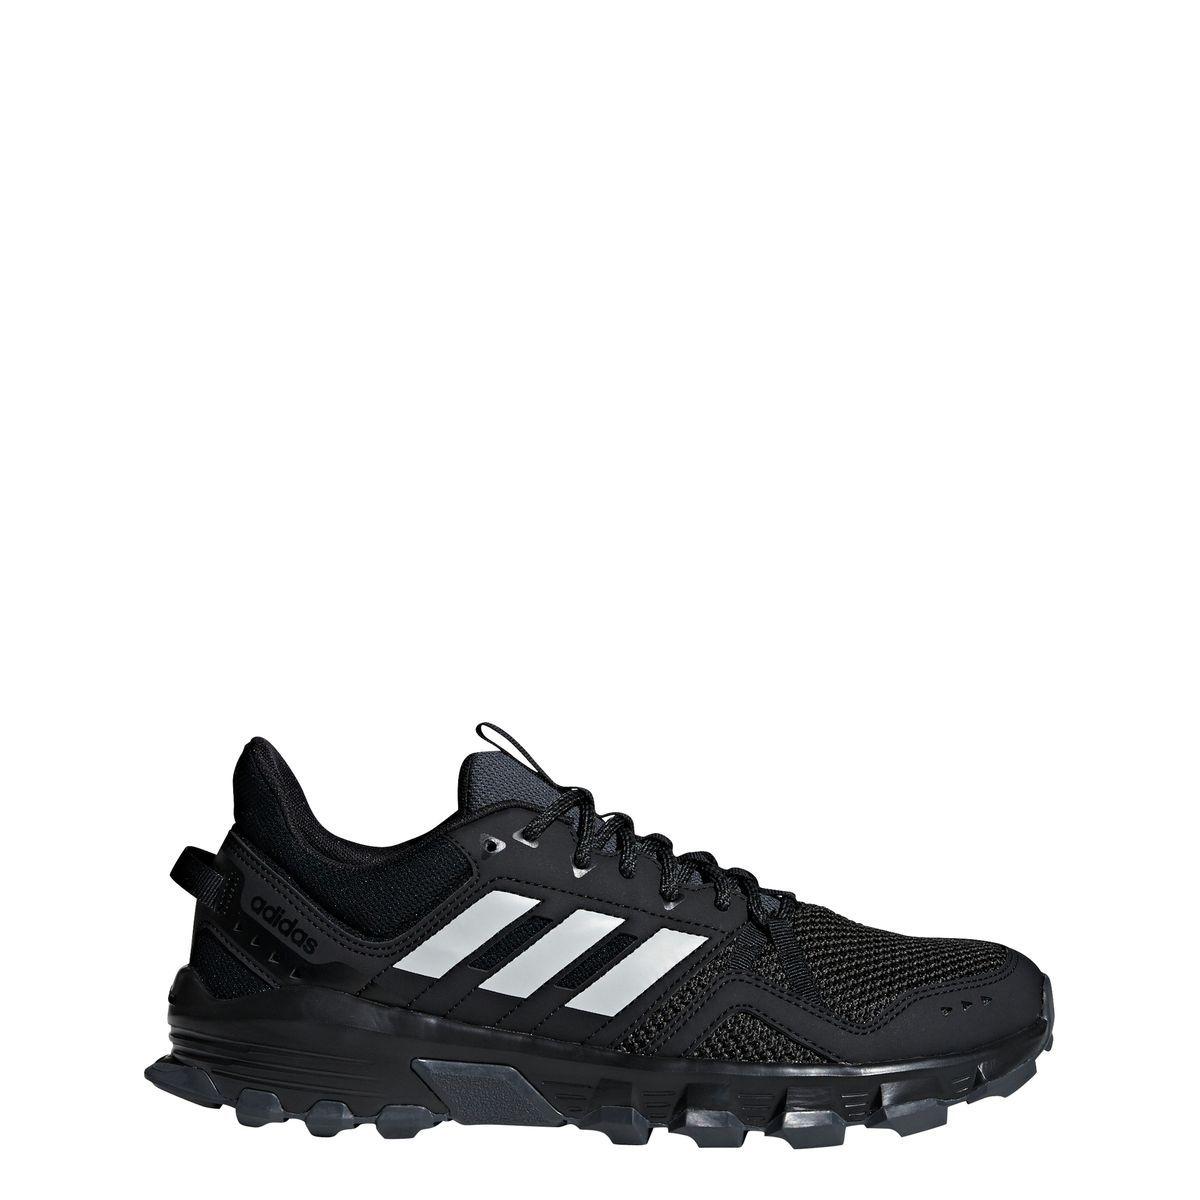 Chaussures ROCKADIA TRAIL | Chaussure de trail, Chaussure